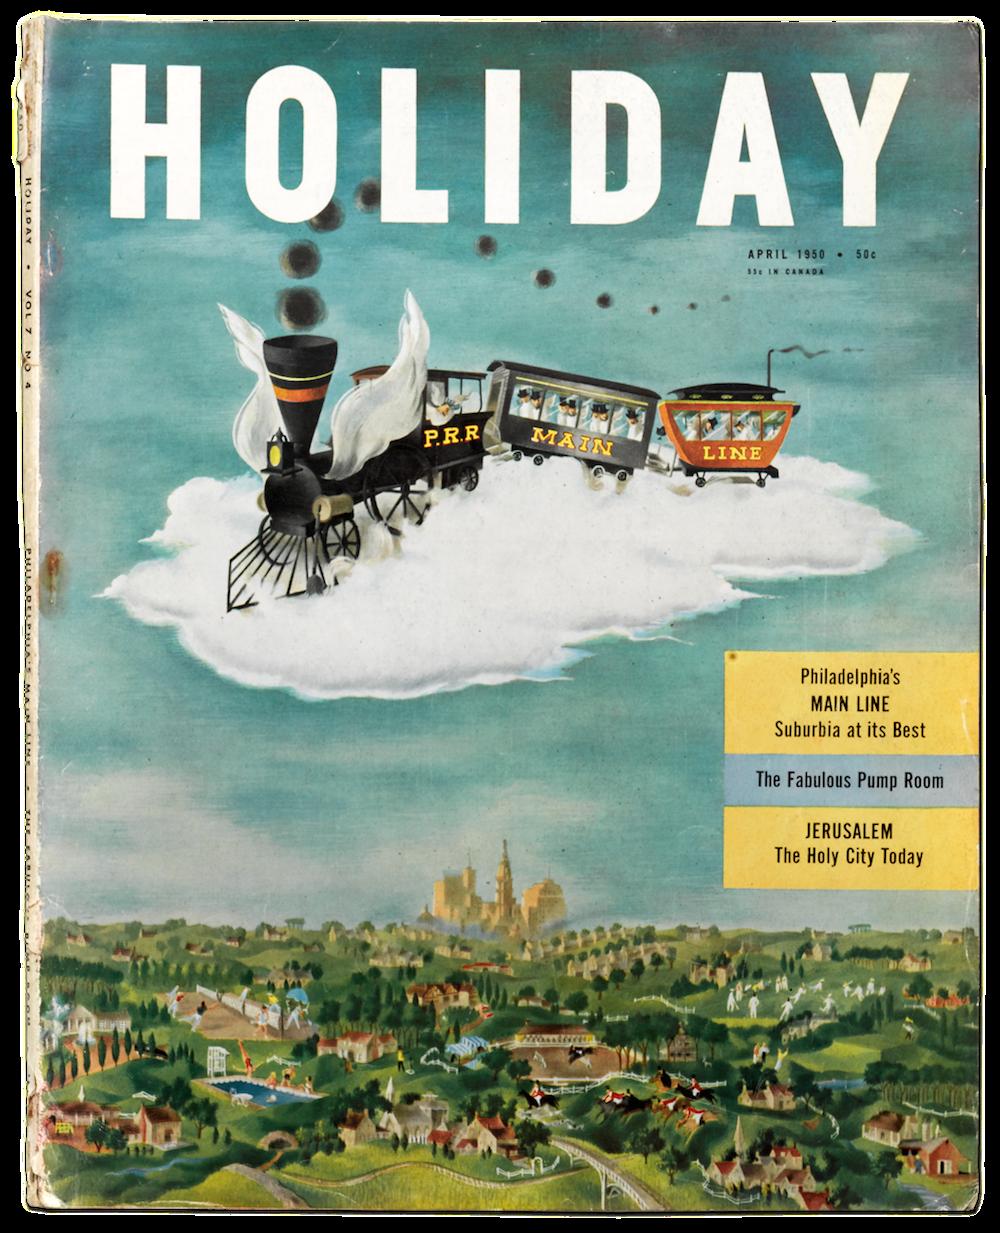 HolidayMagazine.png